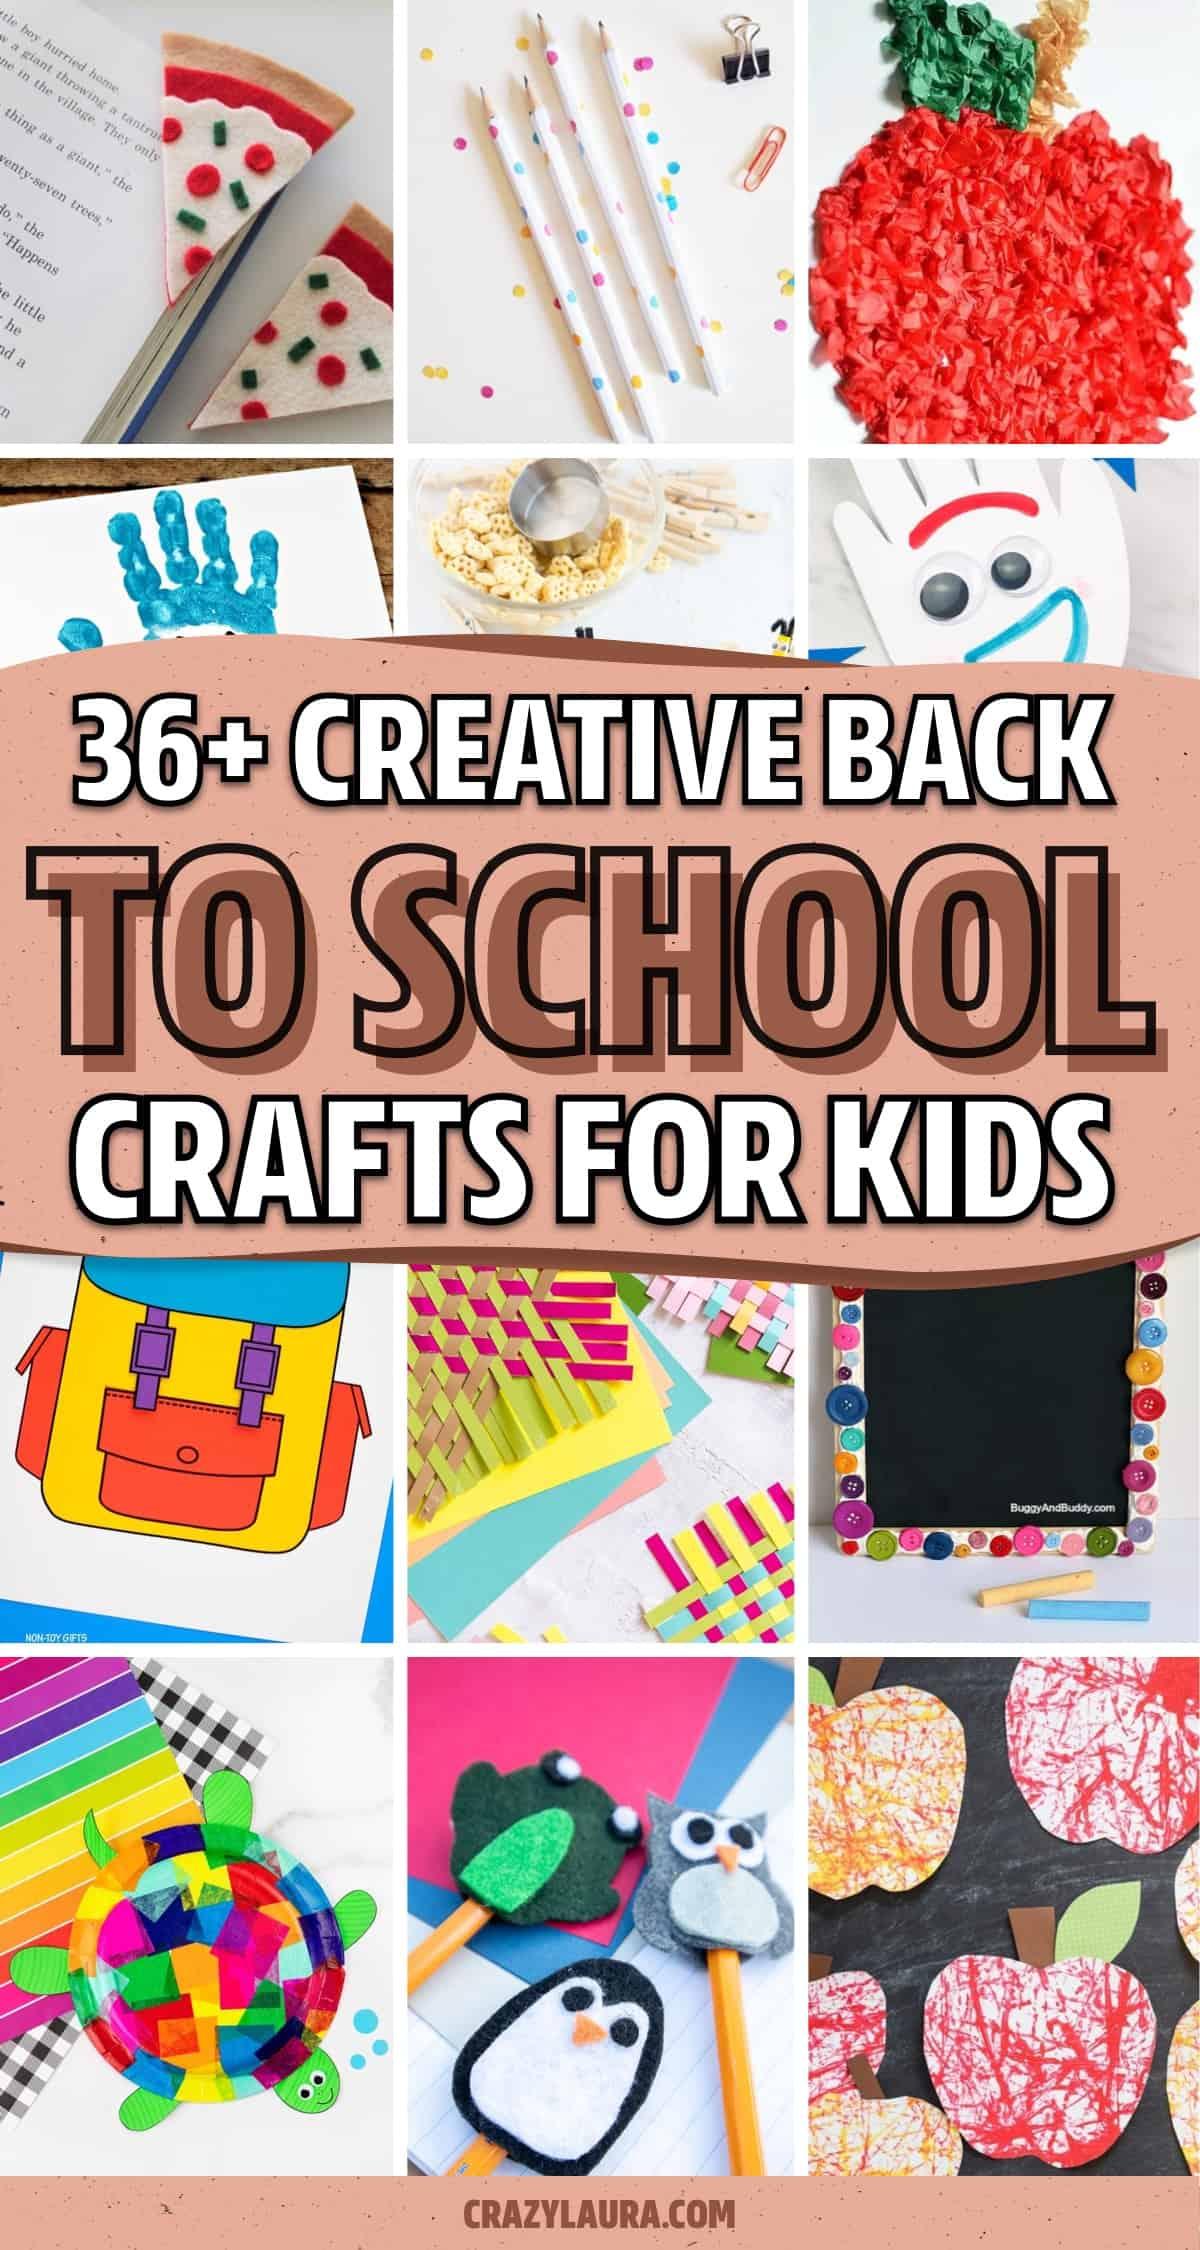 school crafts for kids